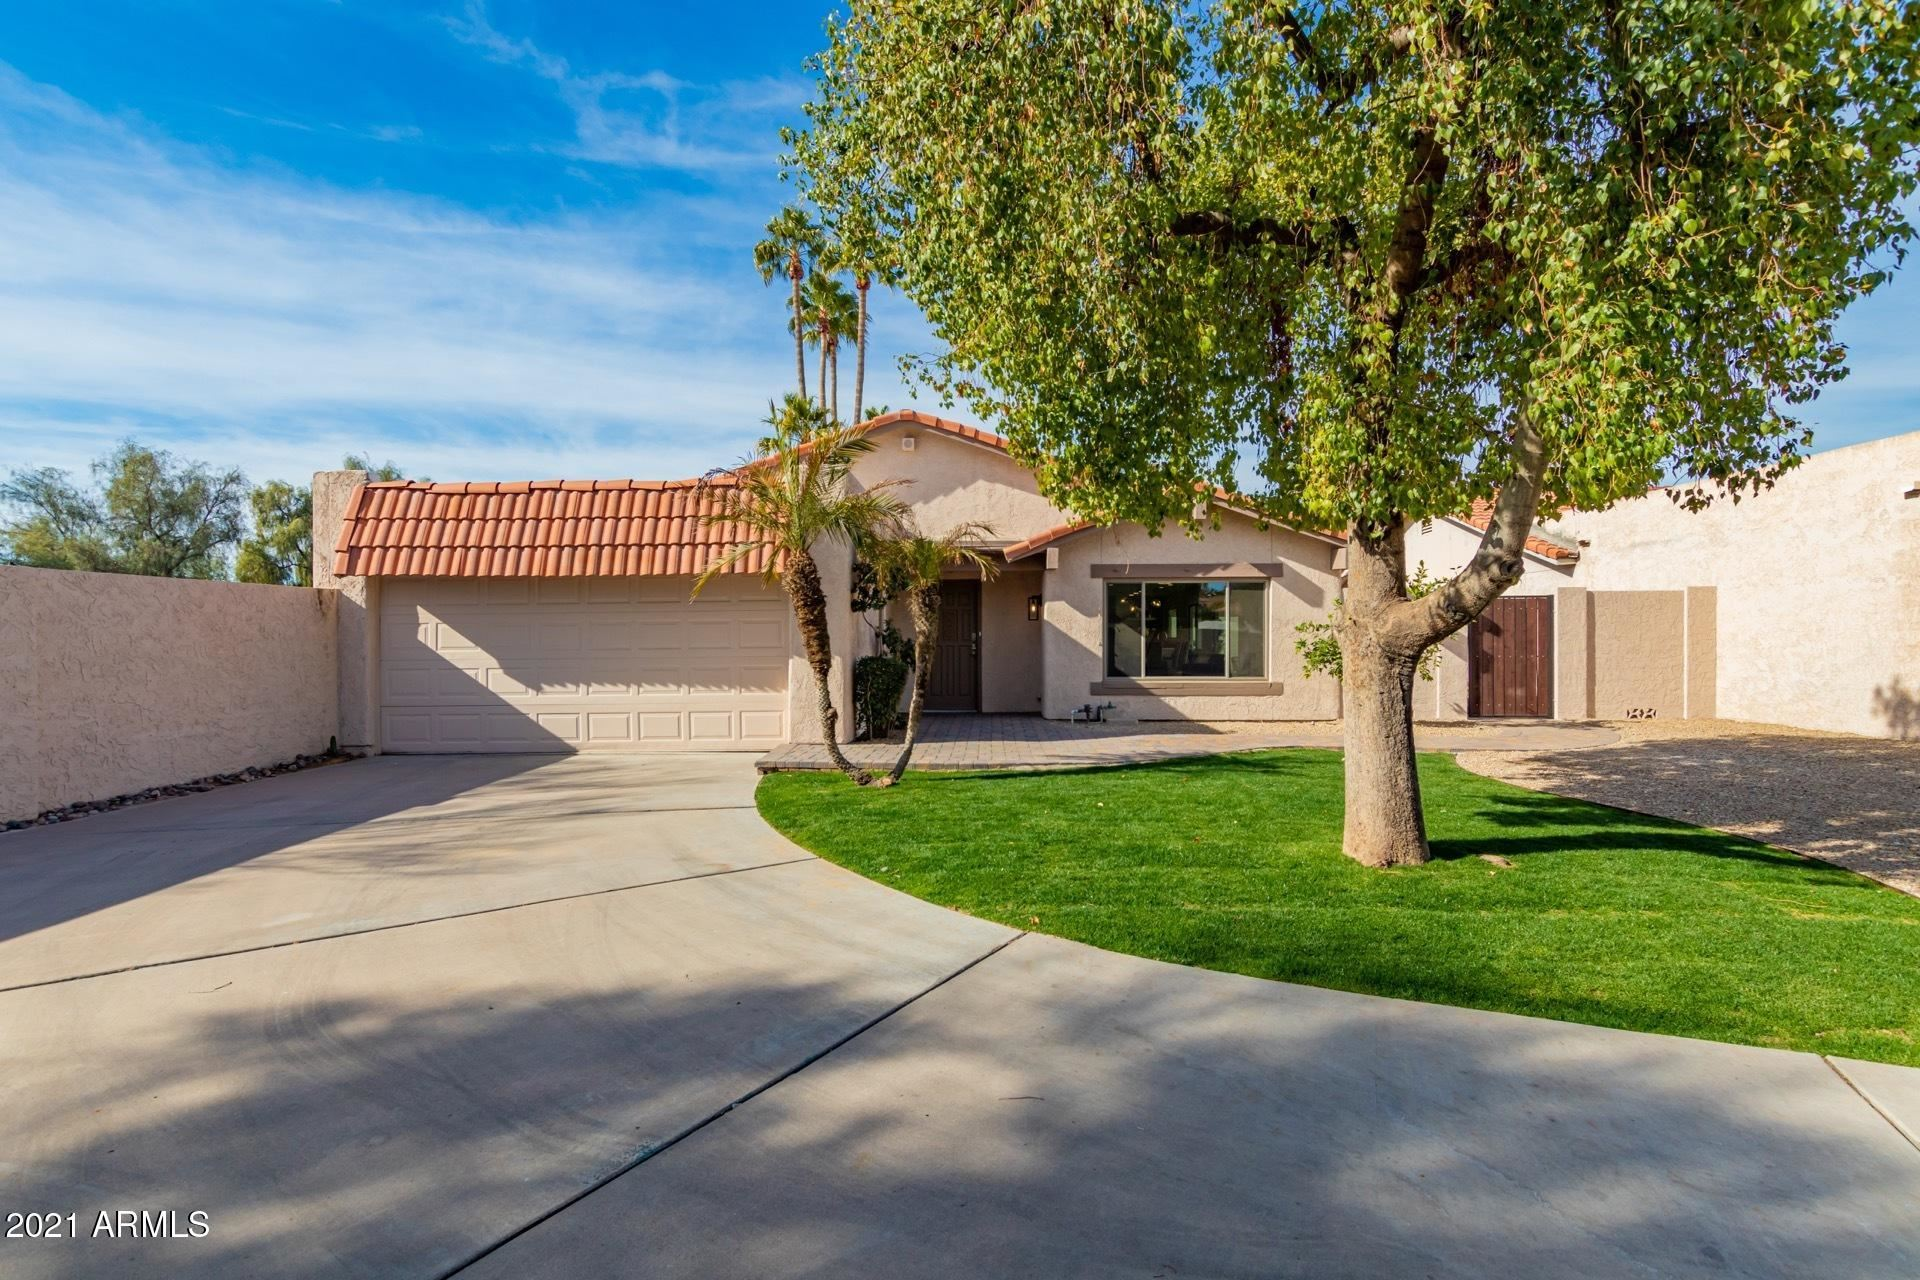 7006 N VIA DE AMOR --, Scottsdale, AZ 85258 - MLS#: 6181843